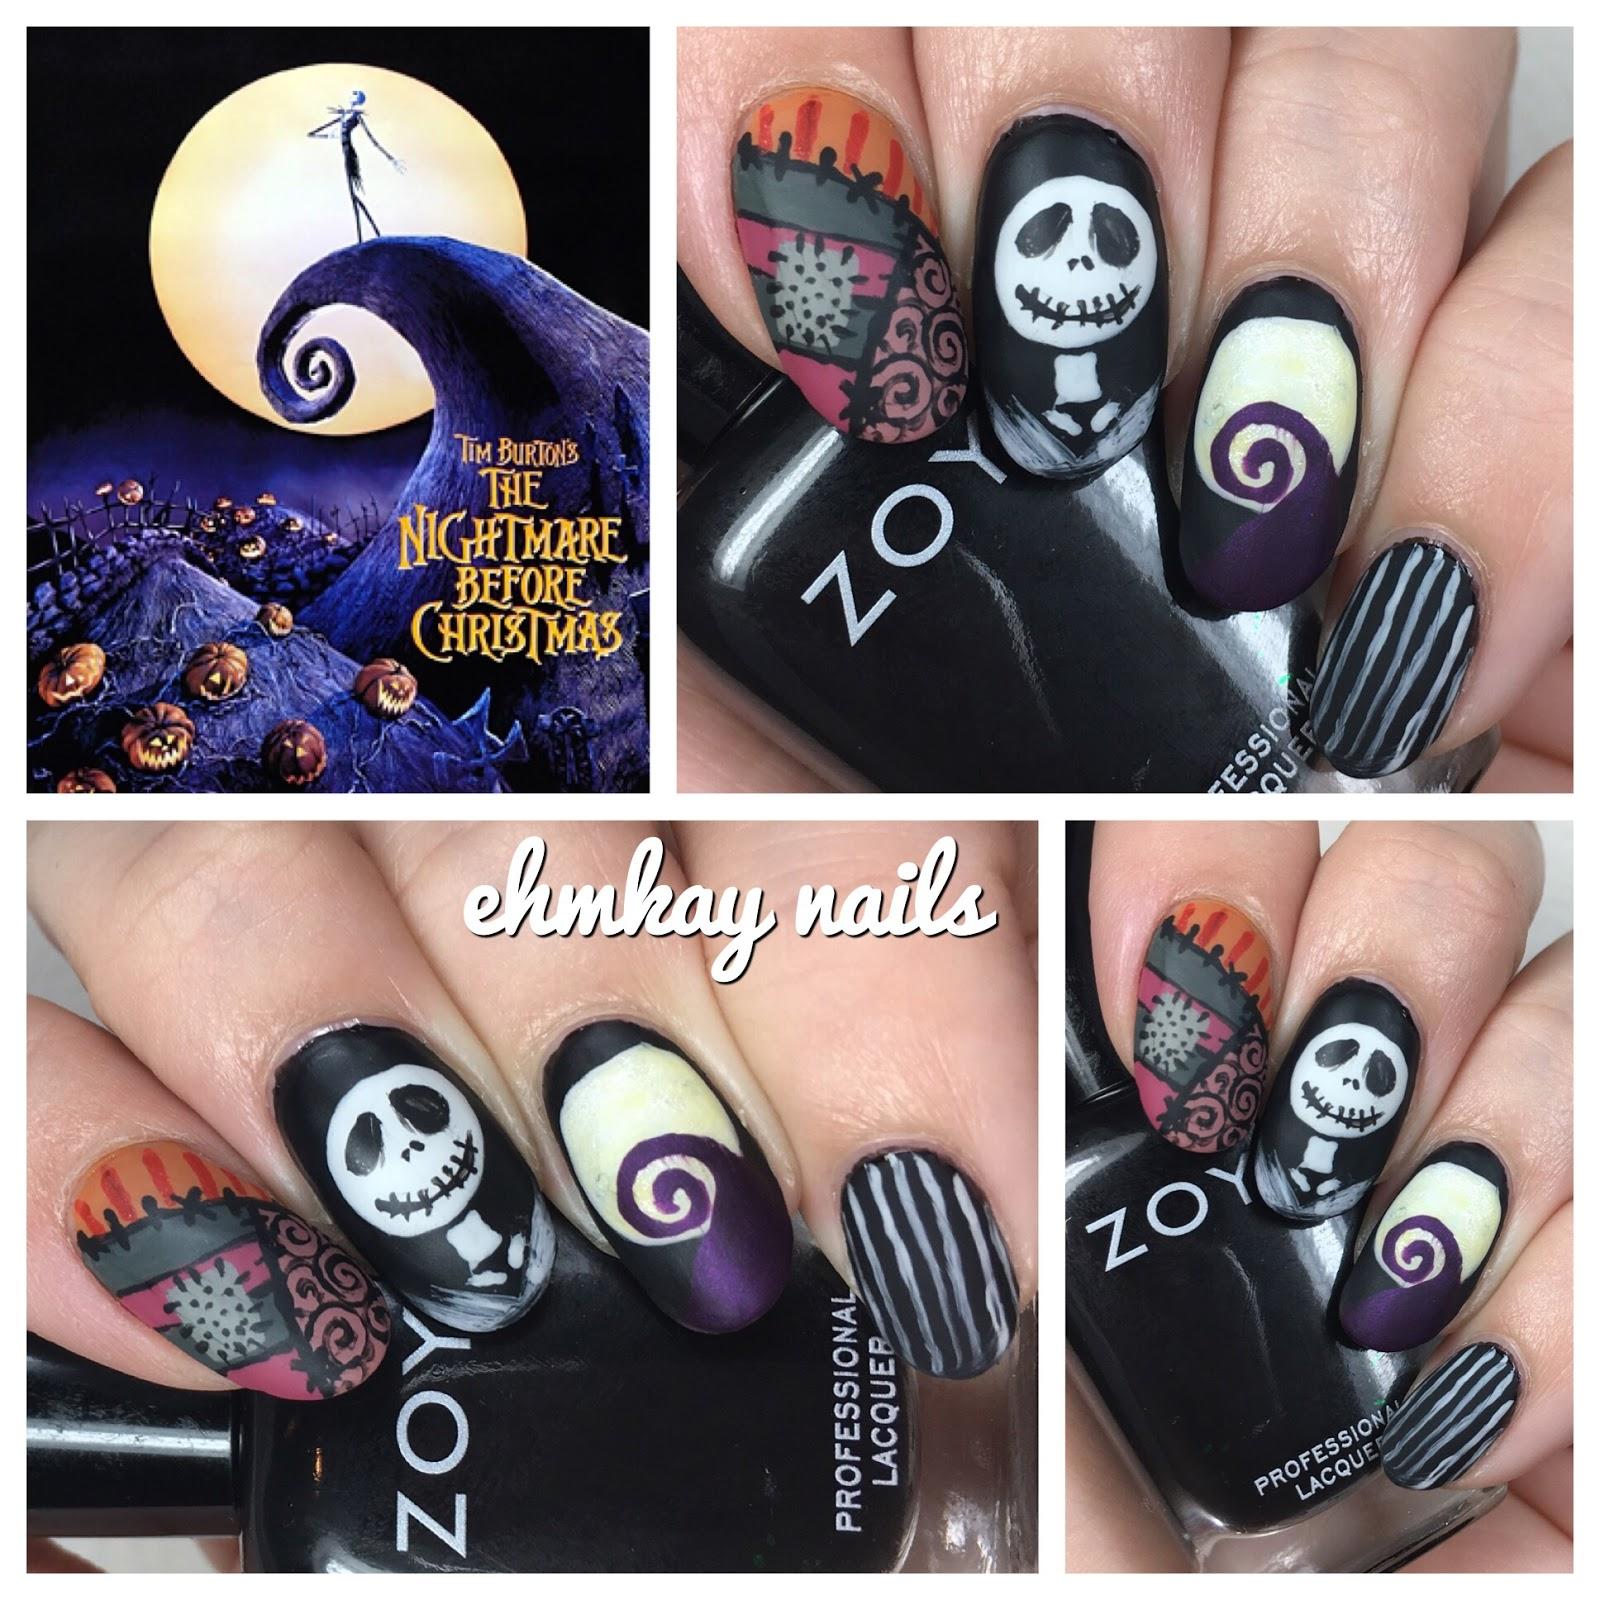 ehmkay nails: 13 Days of Halloween Nail Art: Nightmare ...